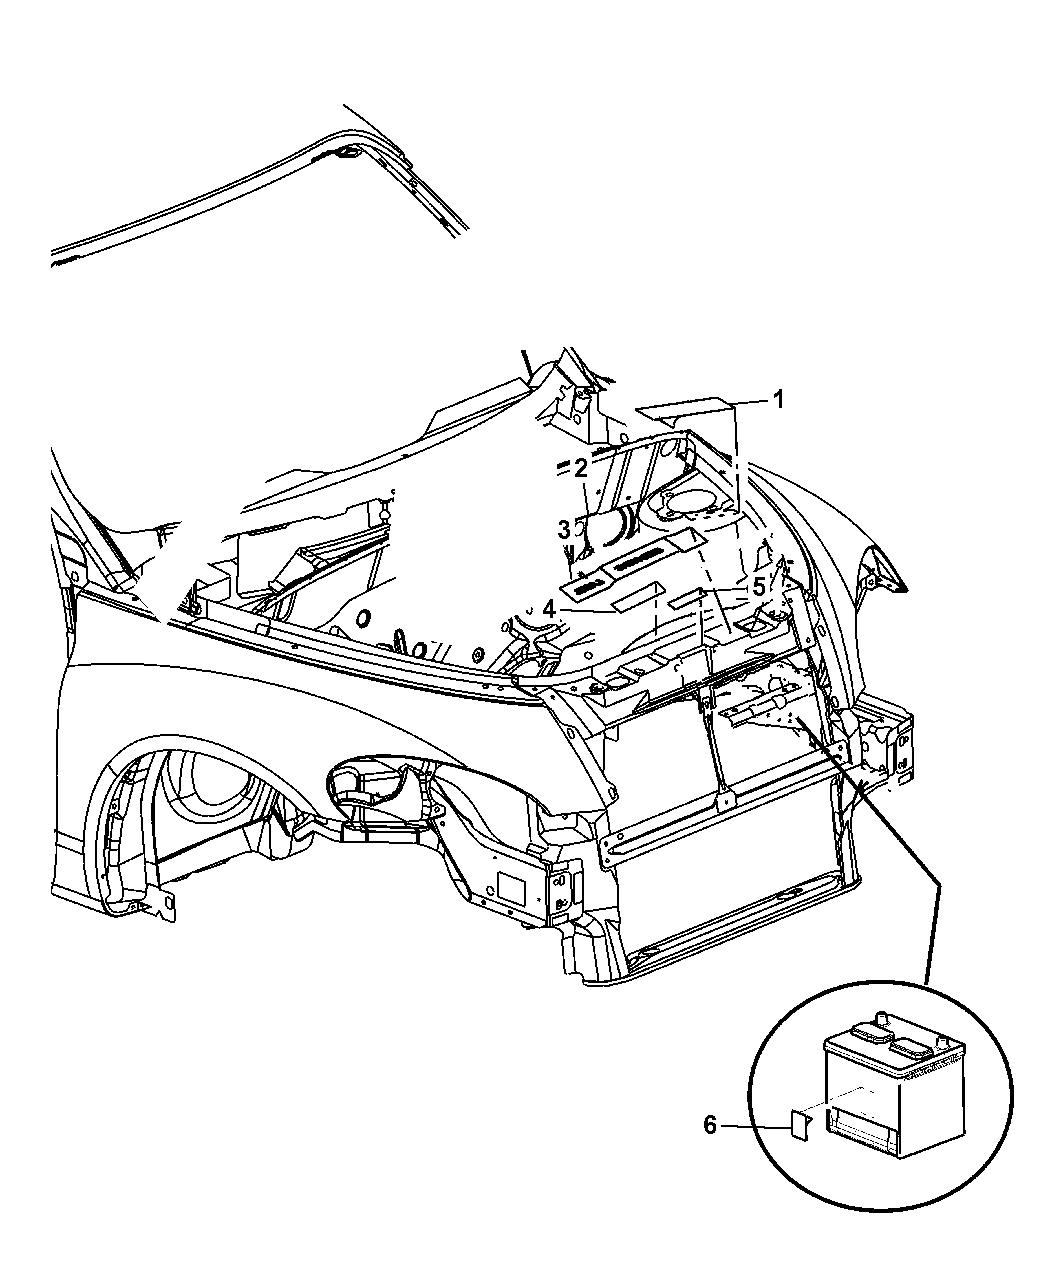 2008 Chrysler Pt Cruiser Engine Compartment